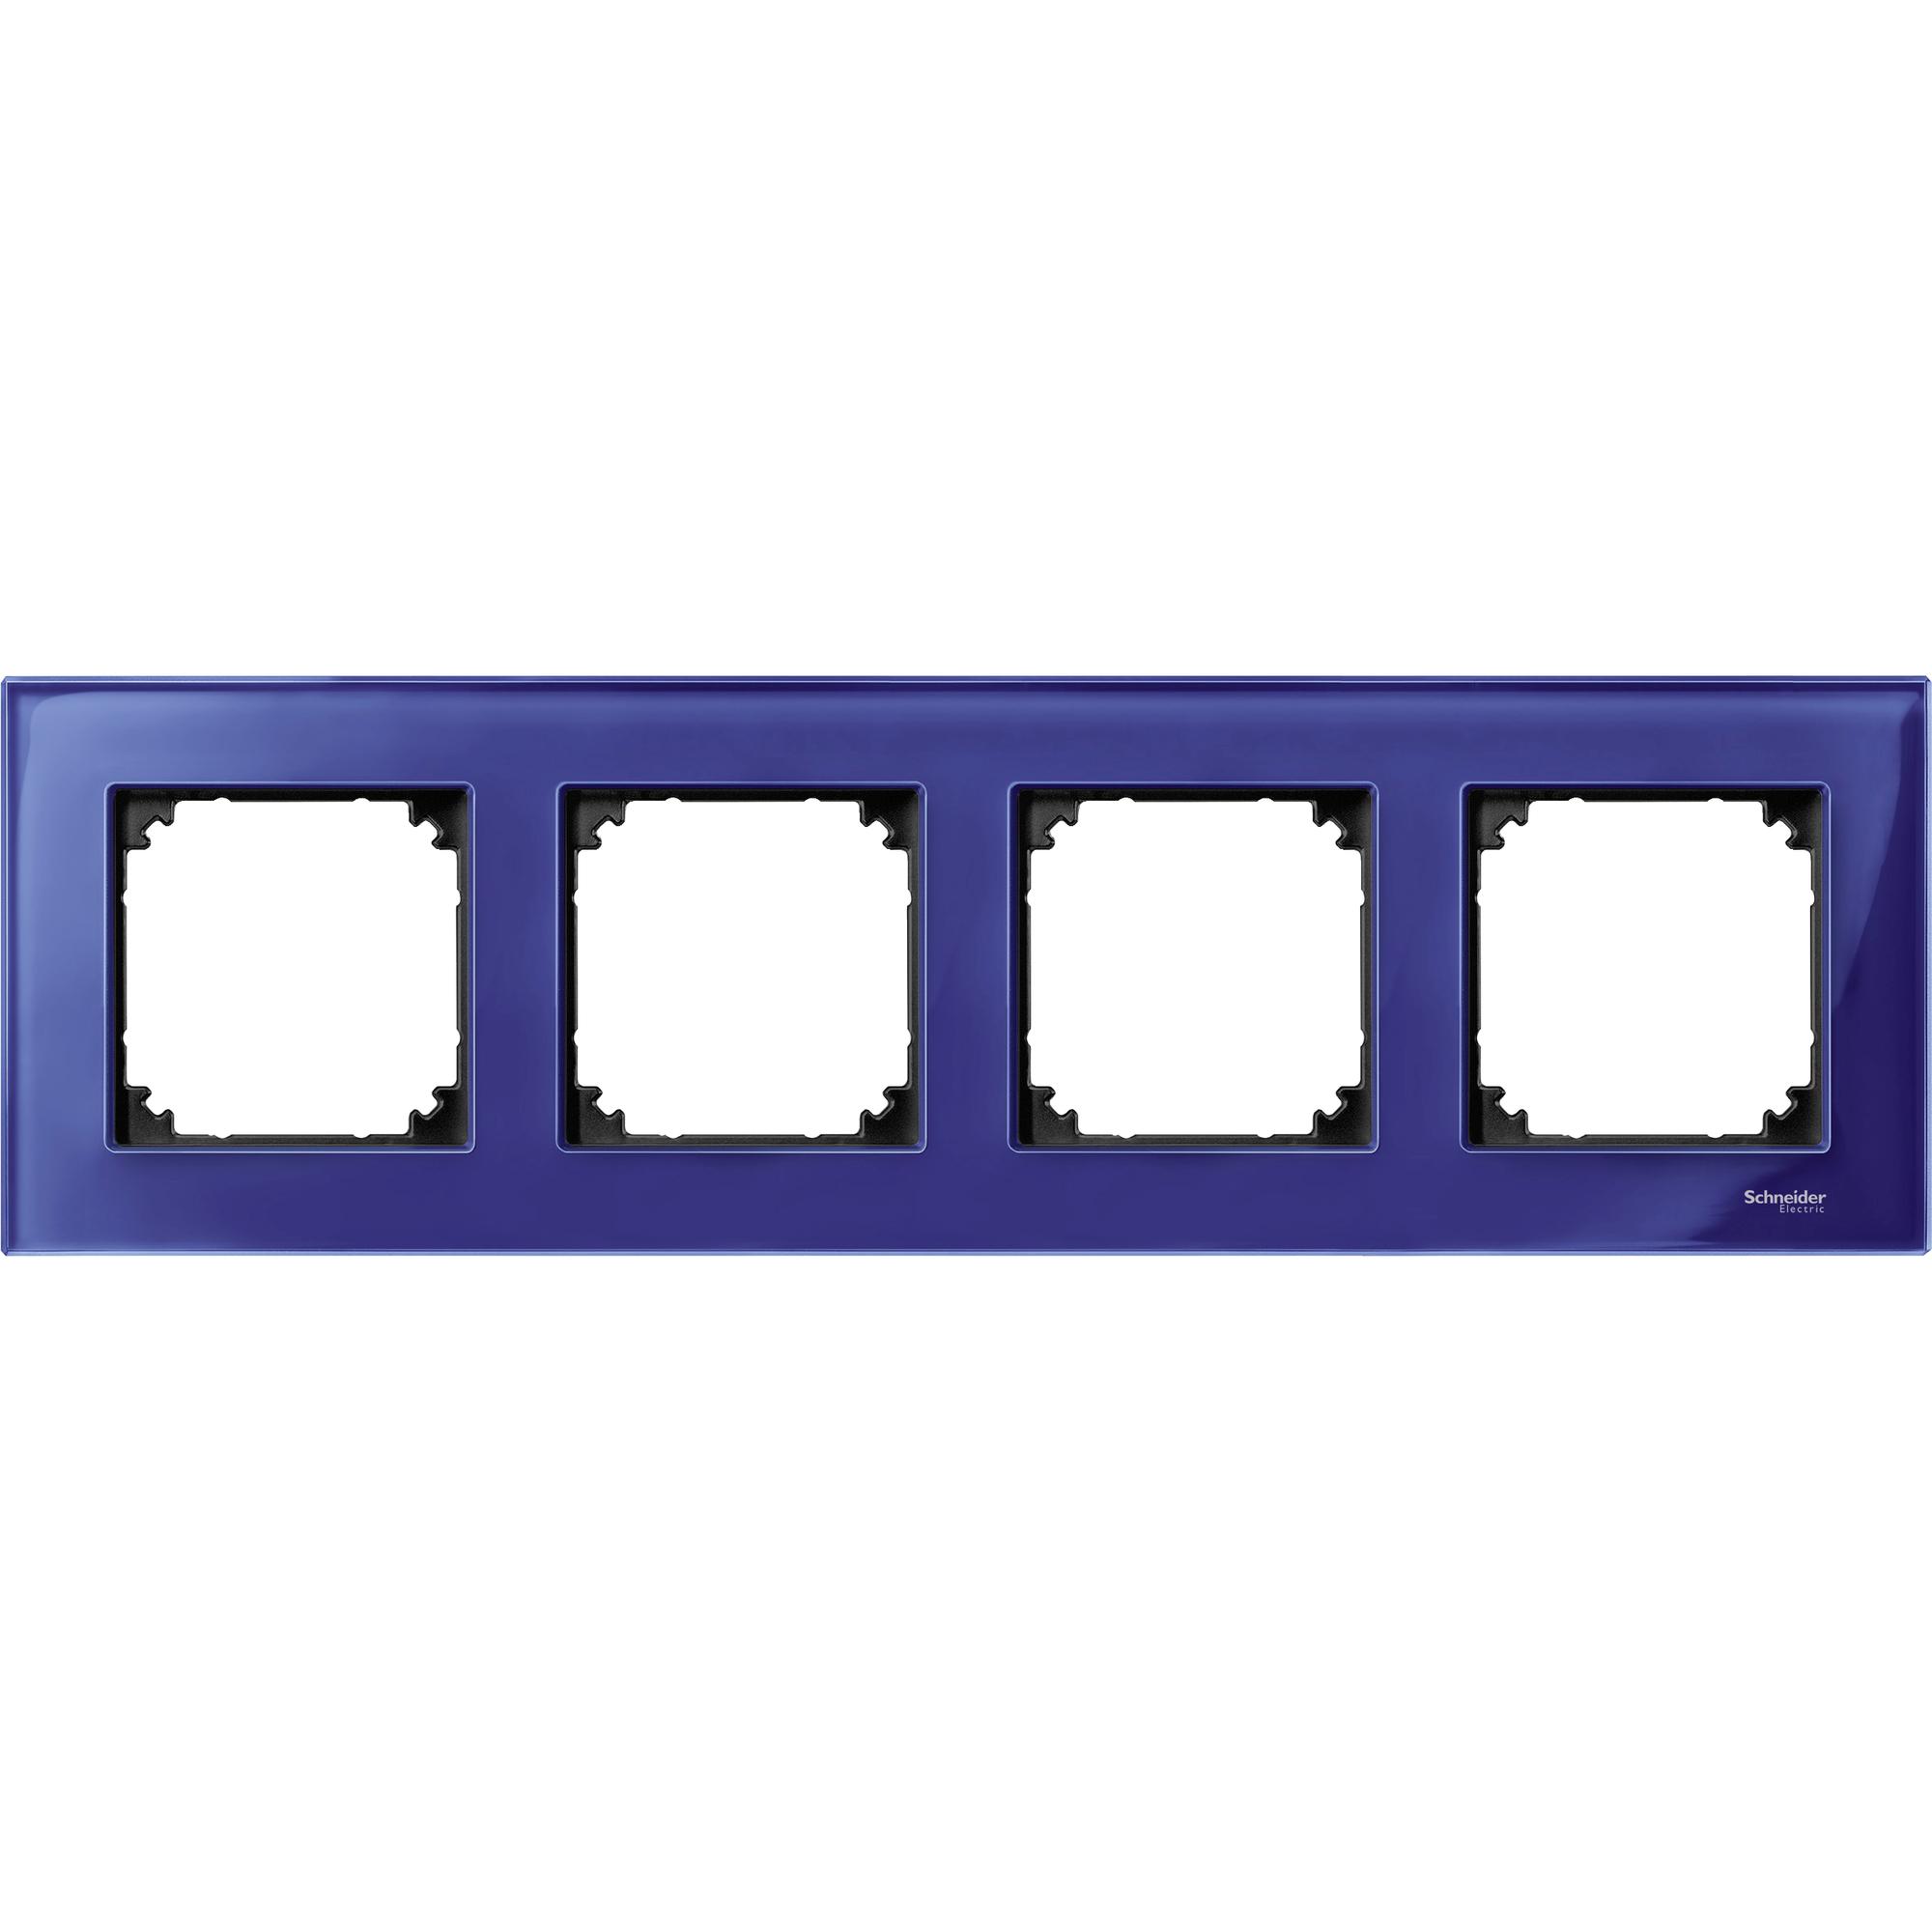 Image Description for https://tedi.itc-electronics.com/itcmedia/images/20190426/MTN40403278_SCHNEIDERELECTRIC_1.jpeg